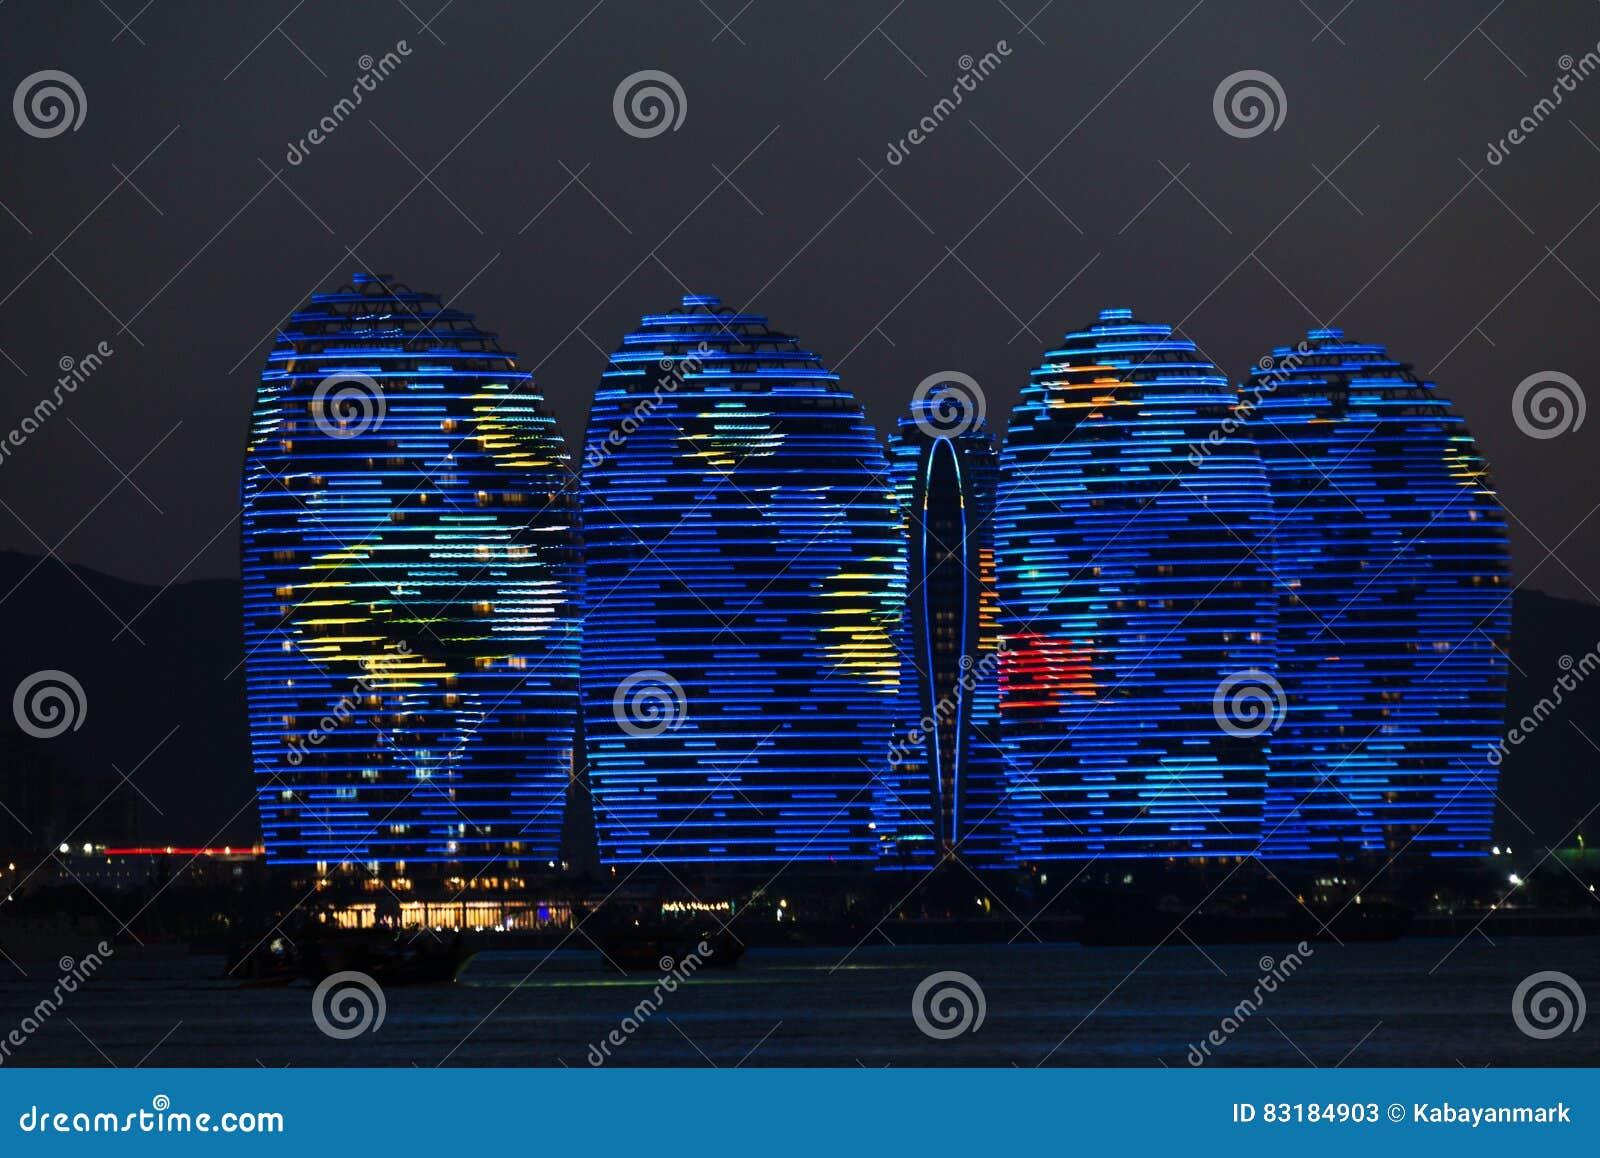 Pheonix Island Sanya, illuminated buildings. Unique modern design